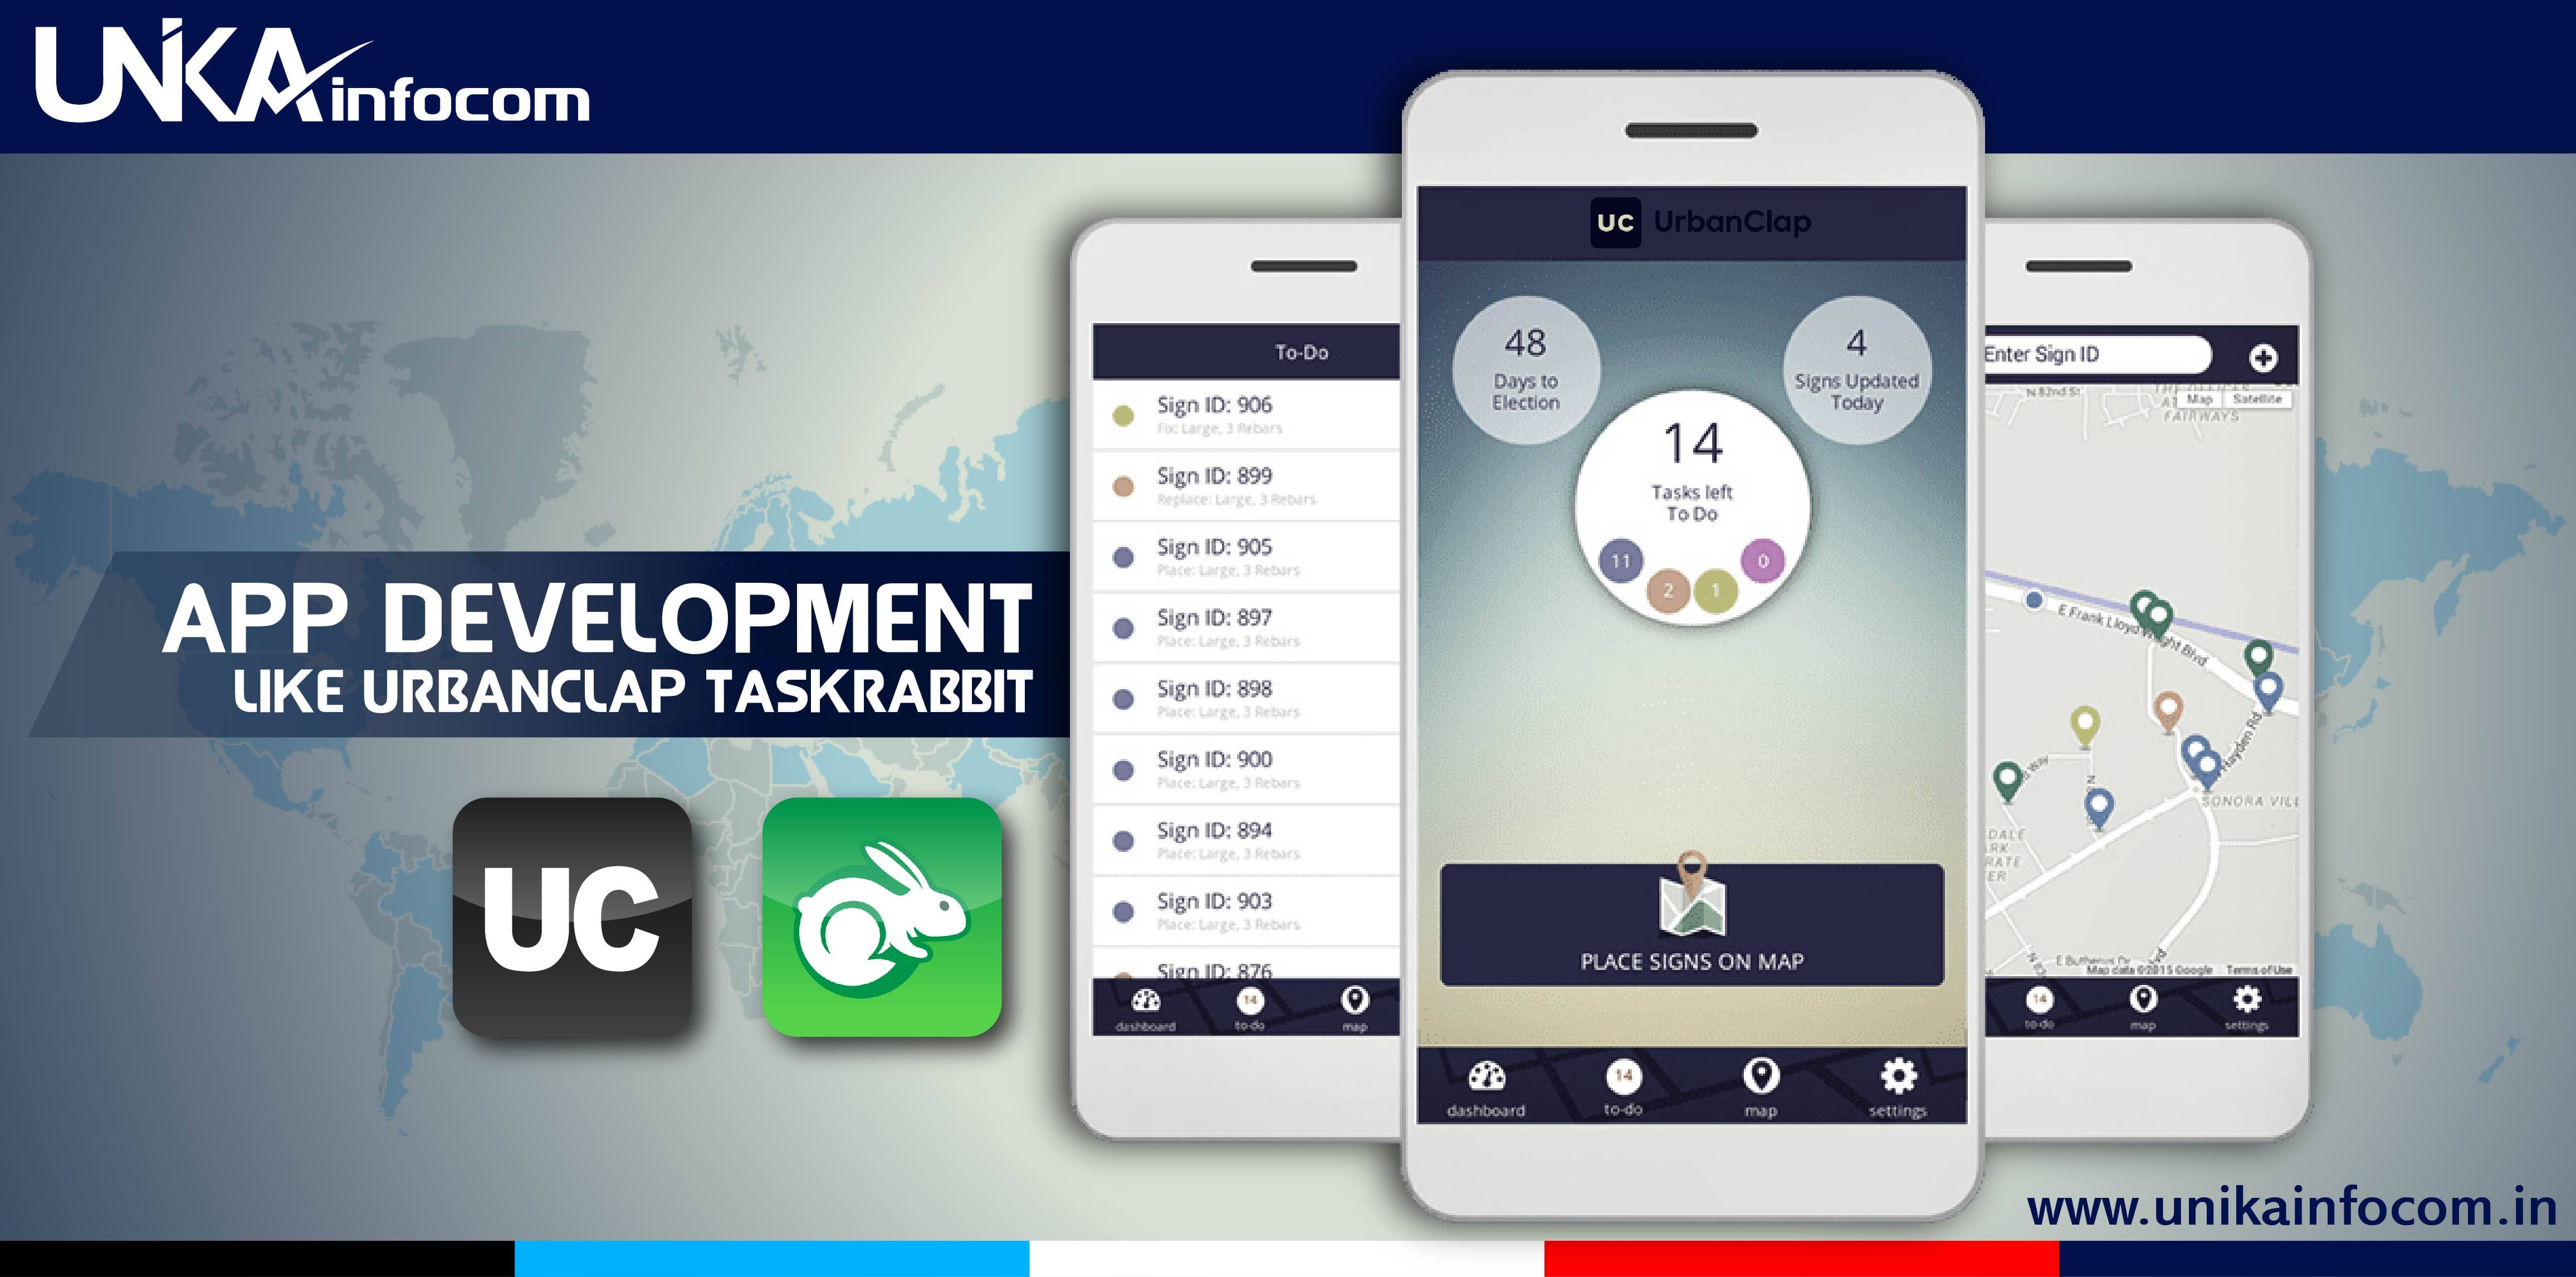 App development like UrbanClap TaskRabbit